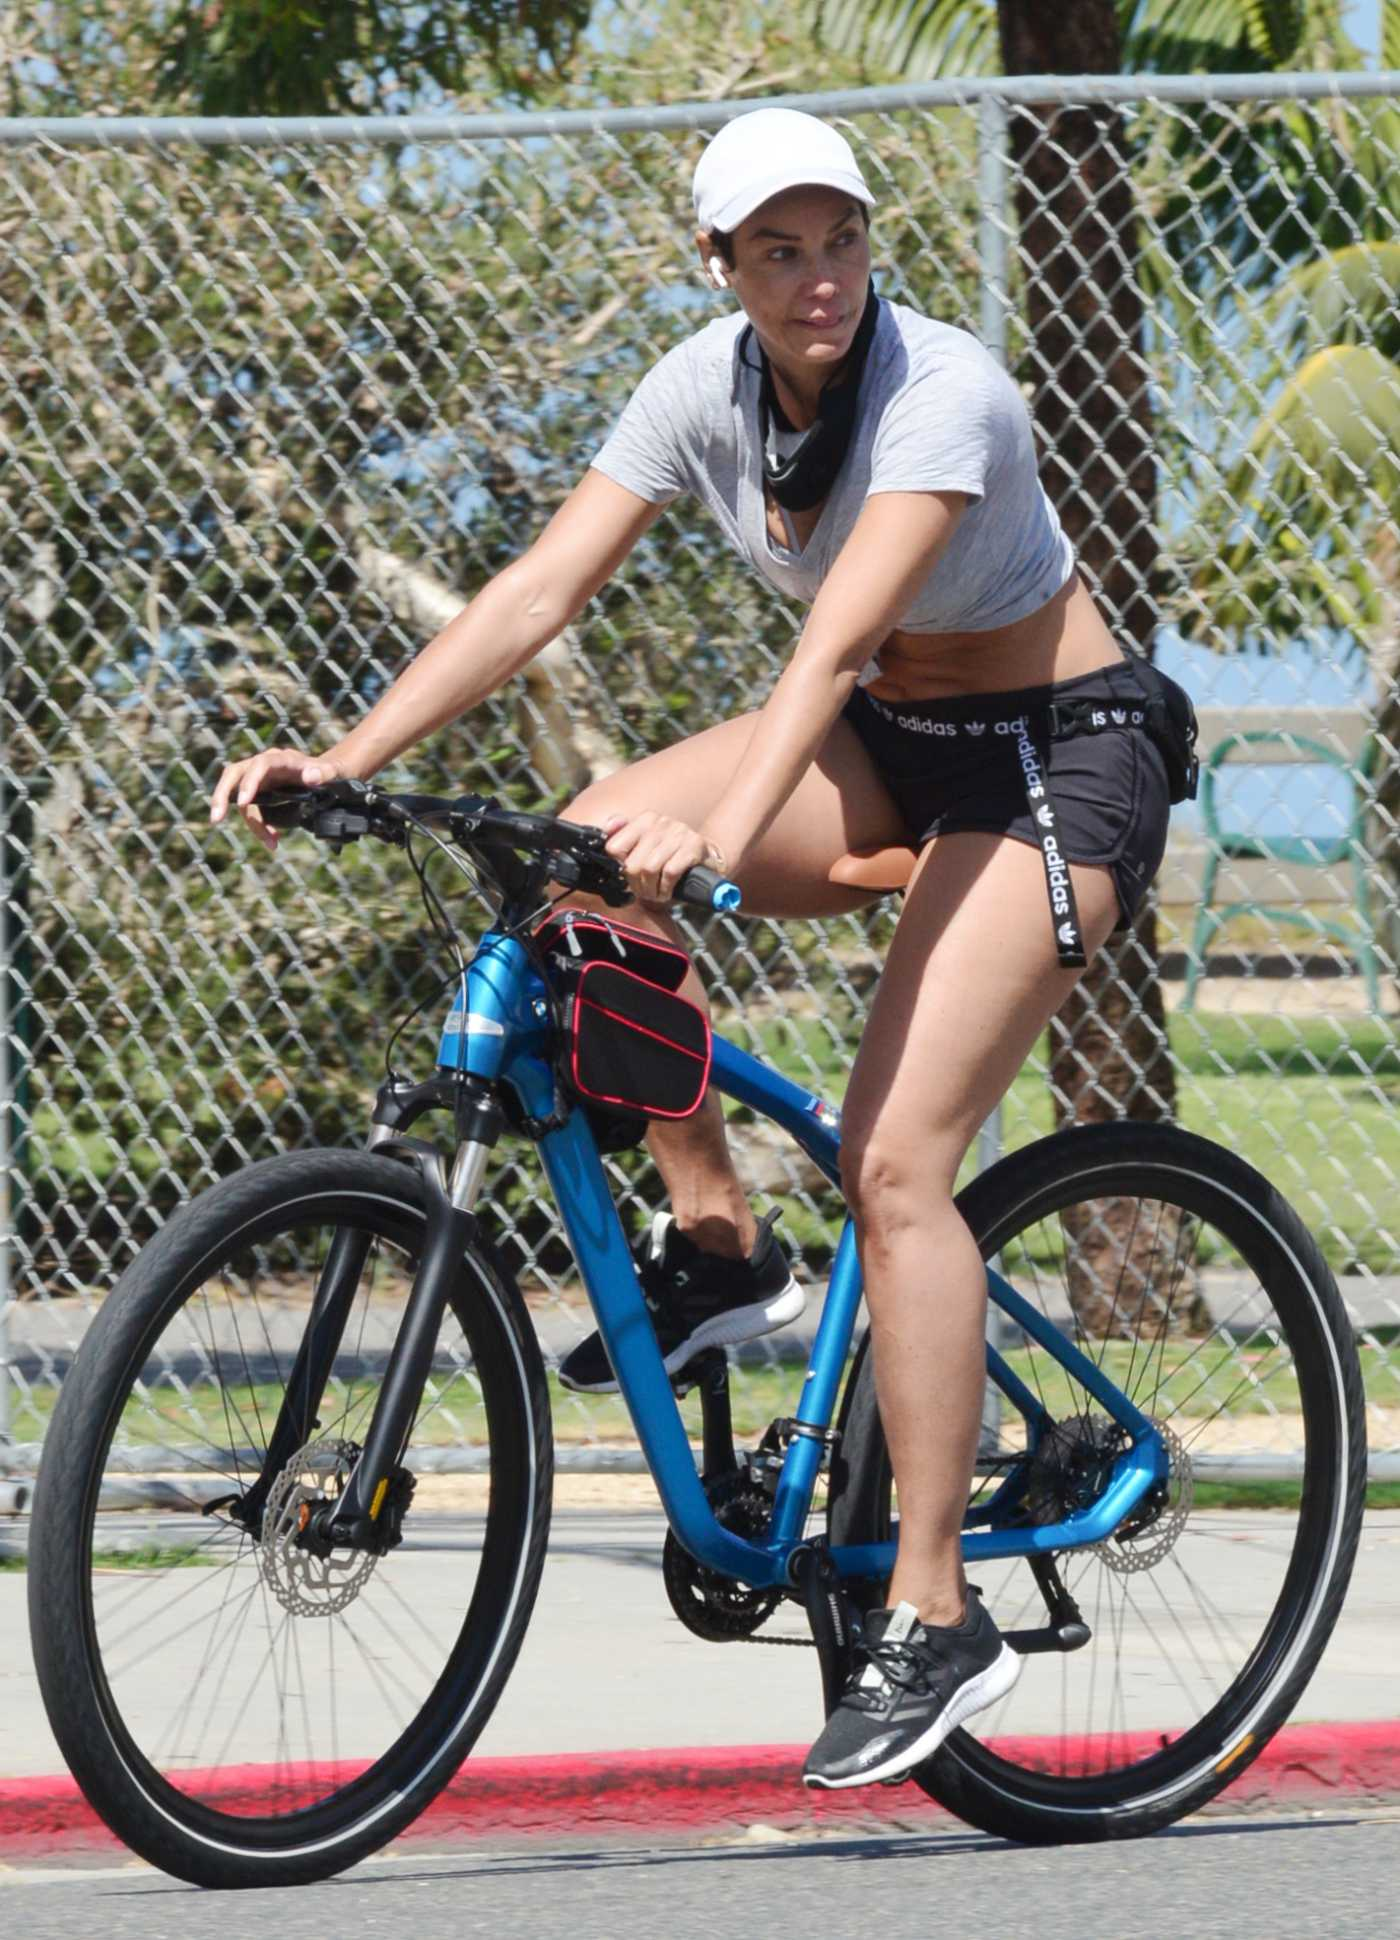 Nicole Murphy in a White Cap Does a Bike Ride in Santa Monica 04/24/2020